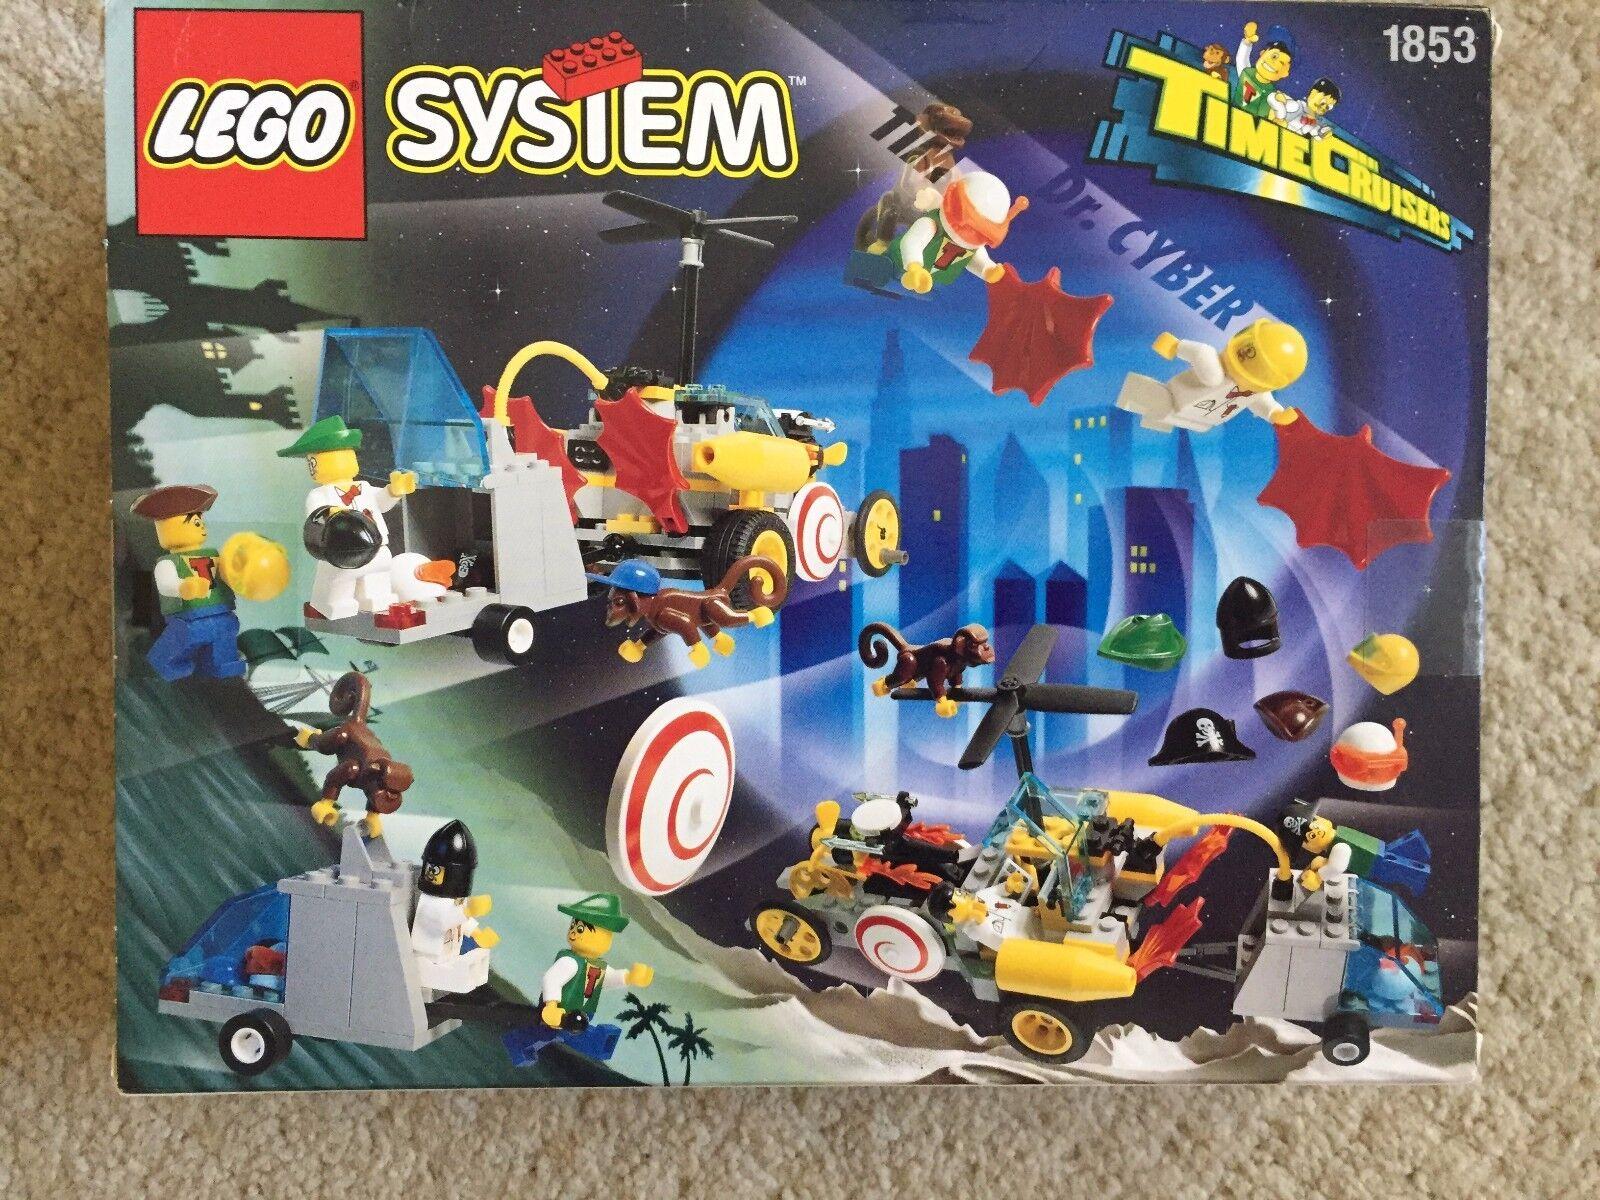 Vintage Lego Time Hypno Cruiser 6492 /1853 new sealed RARE